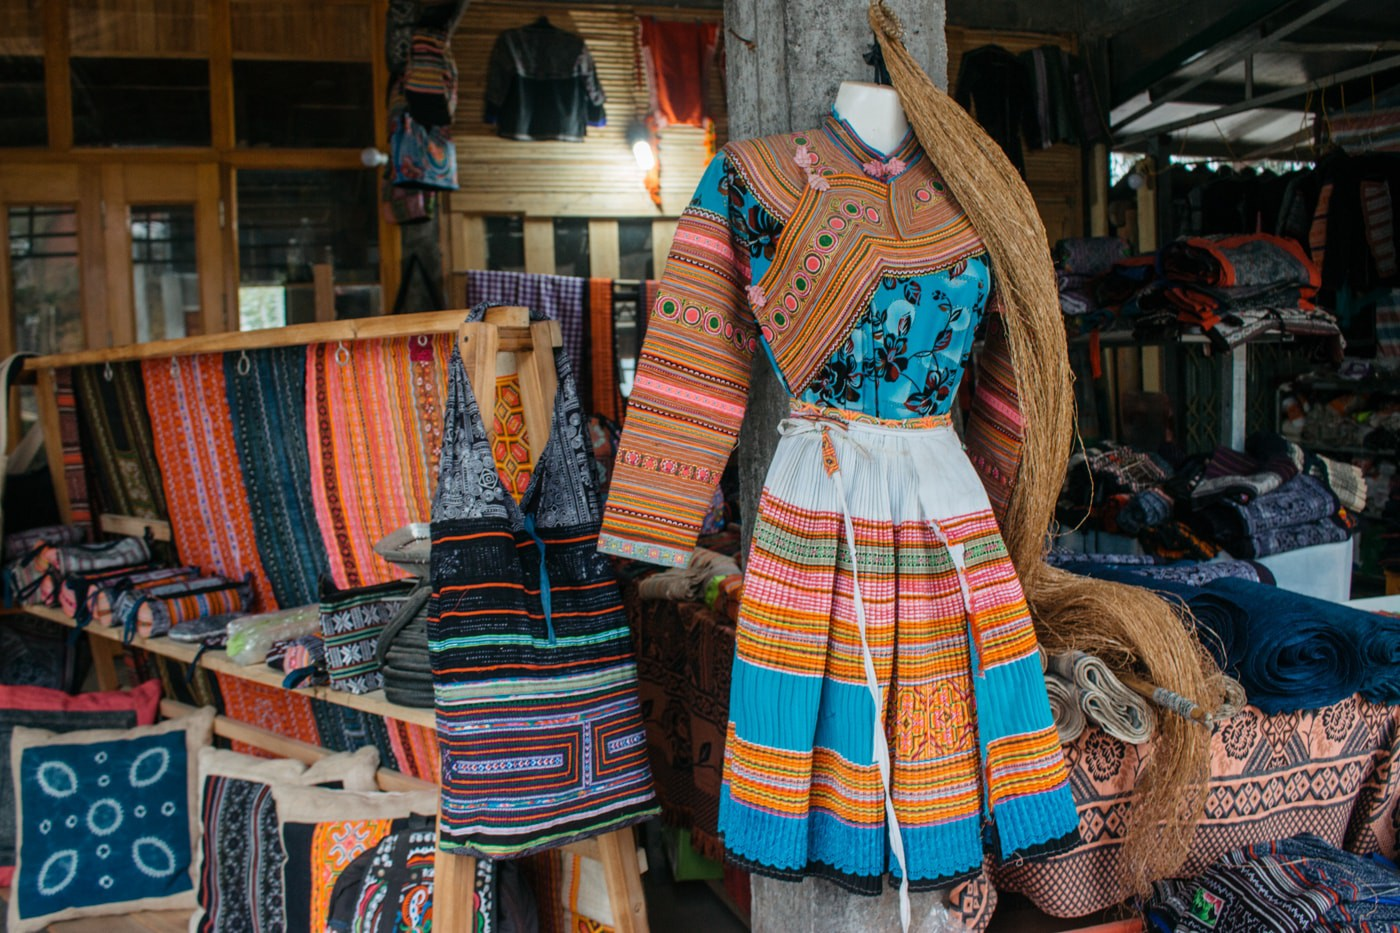 objets d'artisanat local sapa